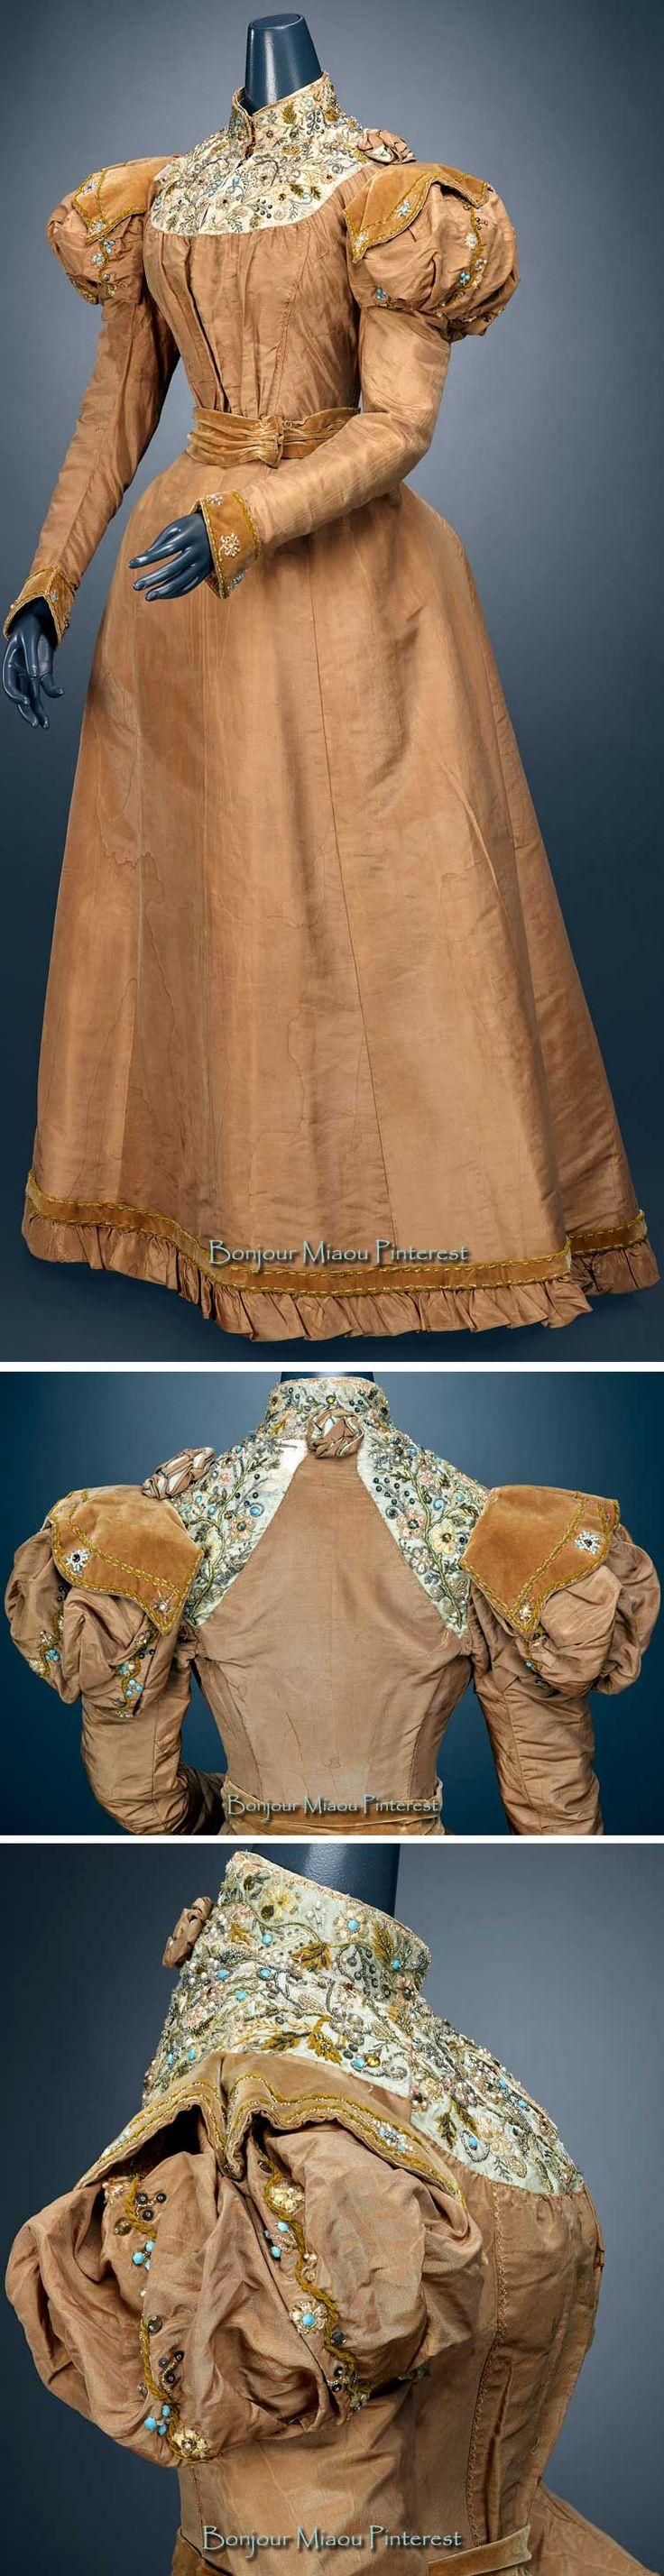 Dress, Mme. De Latour, New York, ca. 1888–92. Silk taffeta, silk velvet, chenille silk, pearl, metal sequins, glass bead embroidery. Indianapolis Museum of Art